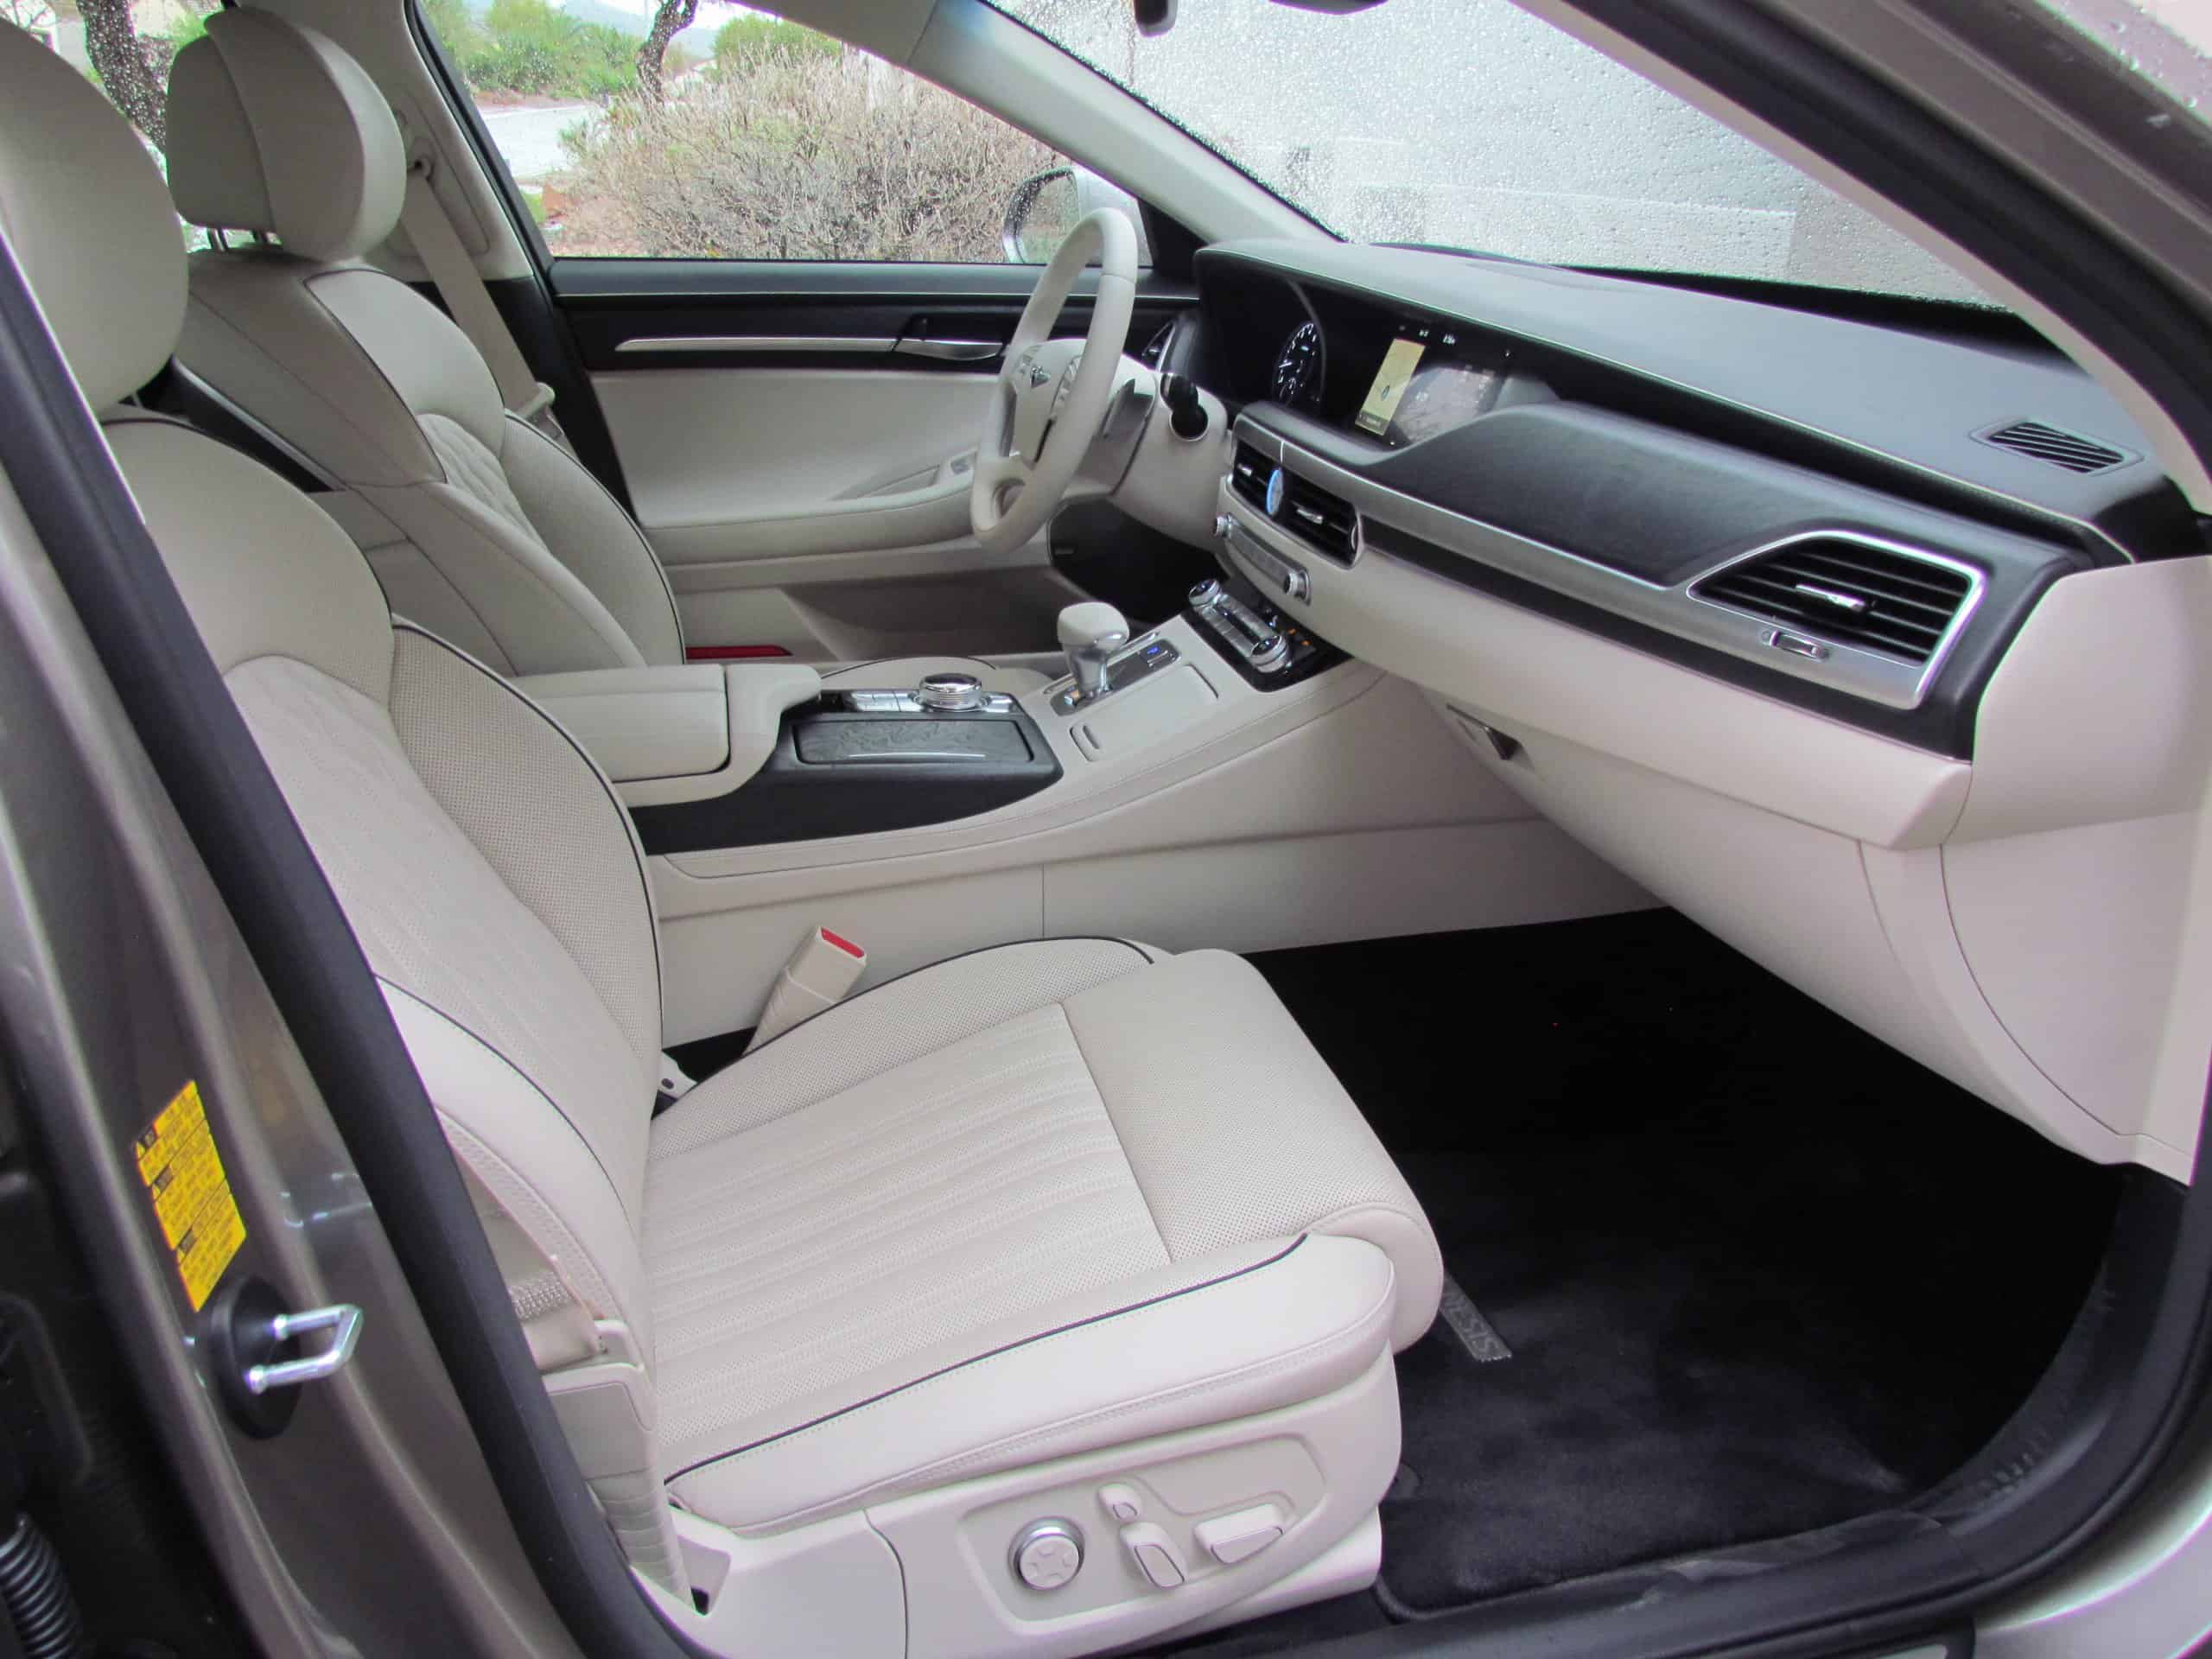 Genesis G90, Driven: Genesis G90 is a South Korean limousine, ClassicCars.com Journal